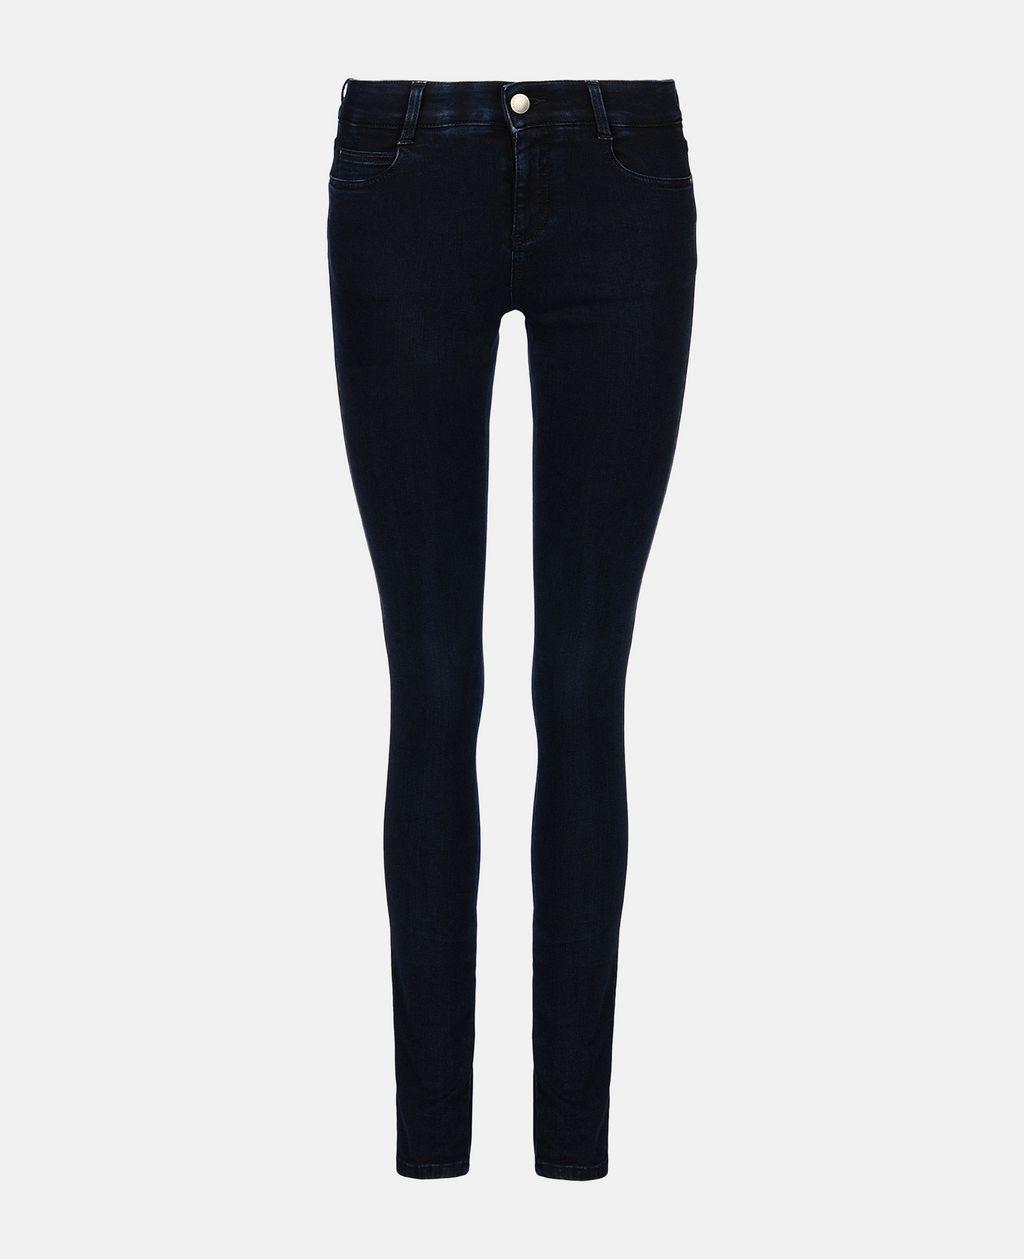 Blue-Black Skinny Long Jeans - STELLA MCCARTNEY